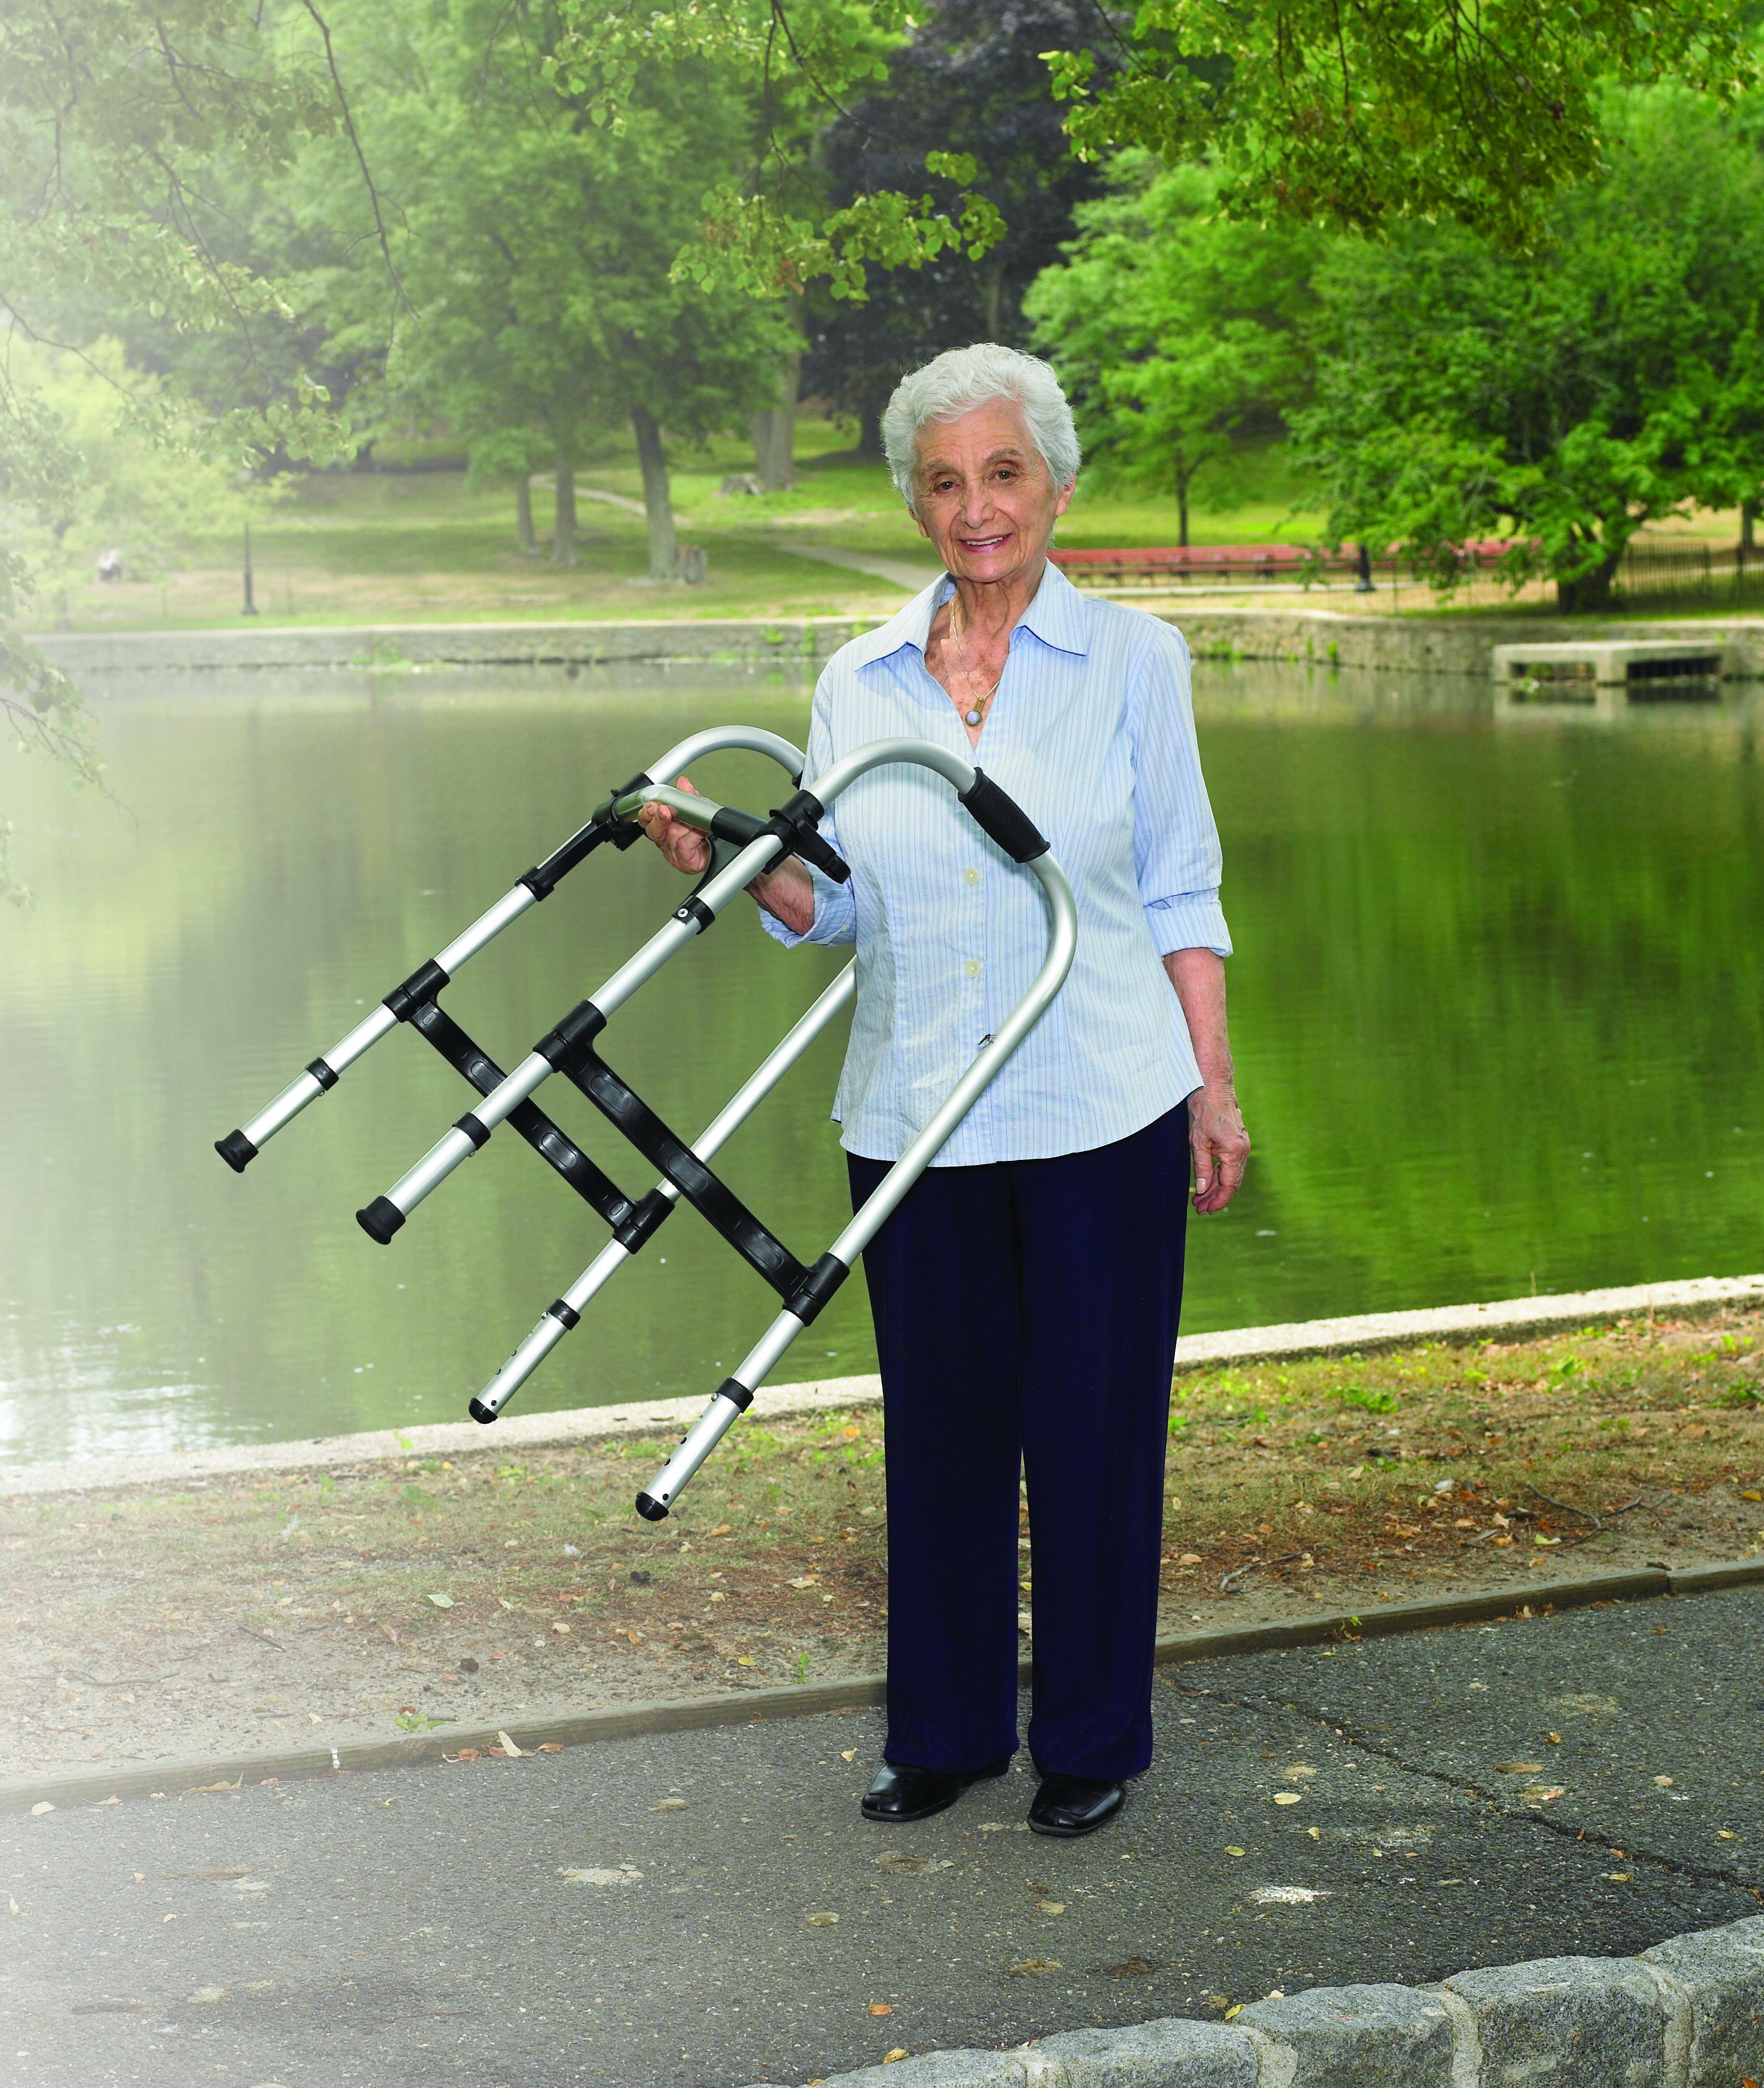 adult-light-weight-paddle-walker-10291-drive-medical-5.jpg